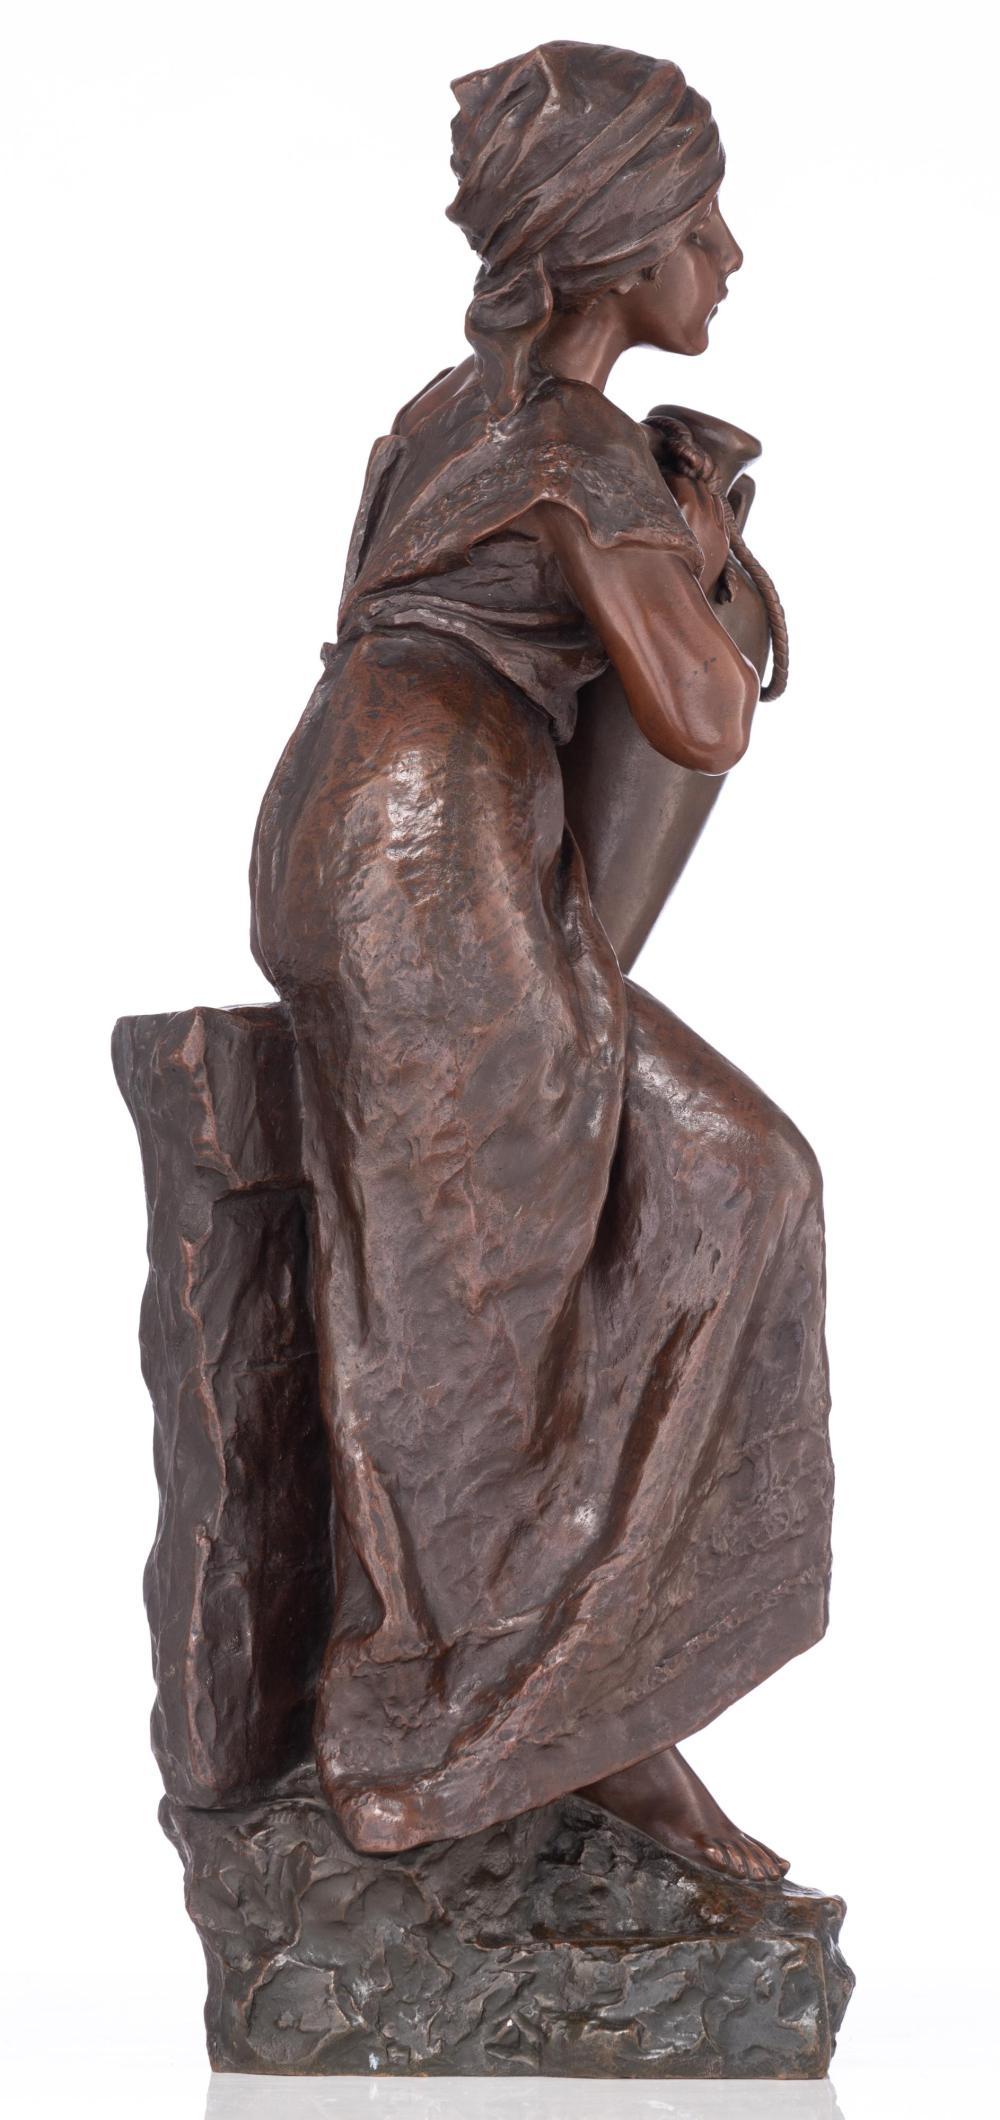 Emmanuel Villanis (1858 - 1914), Rebecca near the well, H 66,5 cm